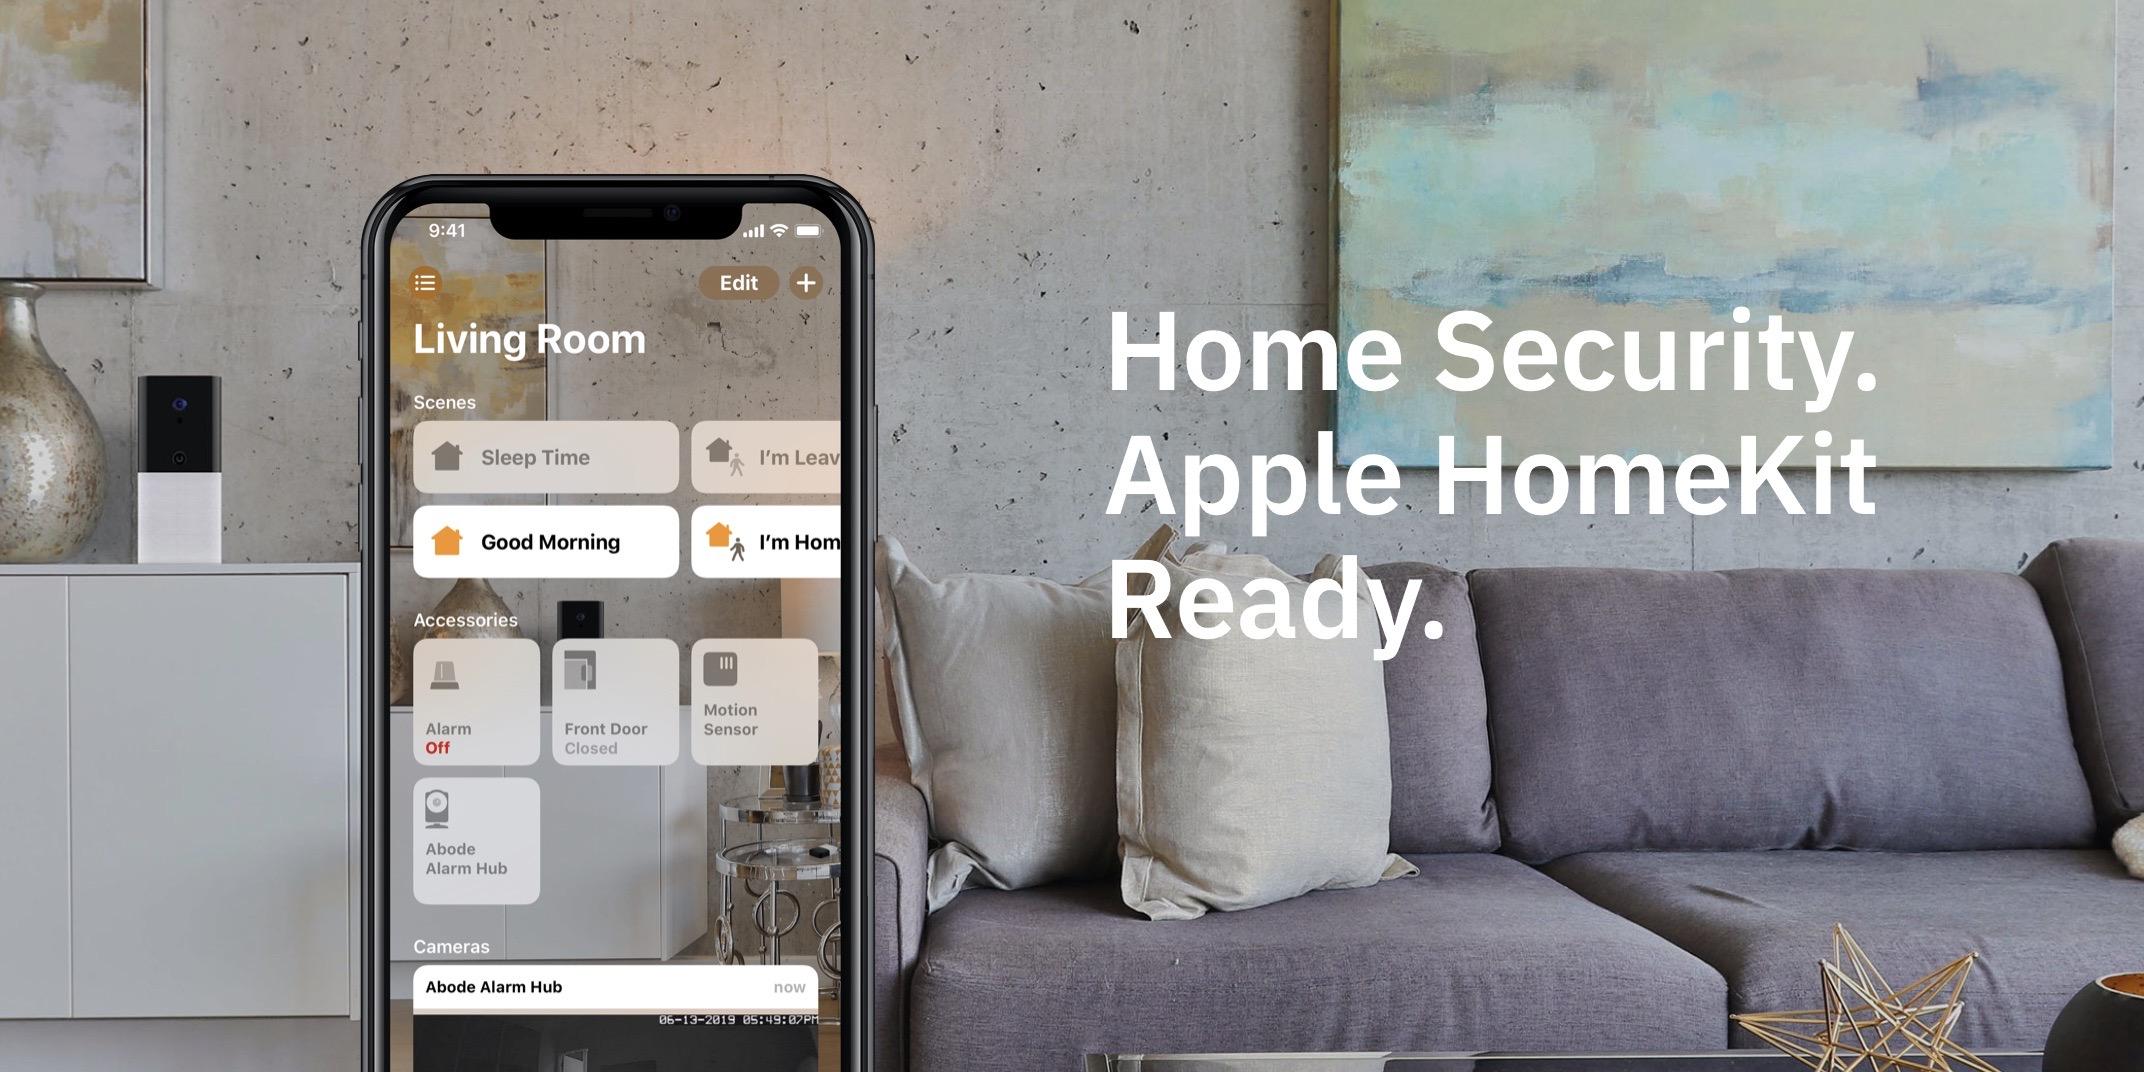 Abode Iota HomeKit home security system